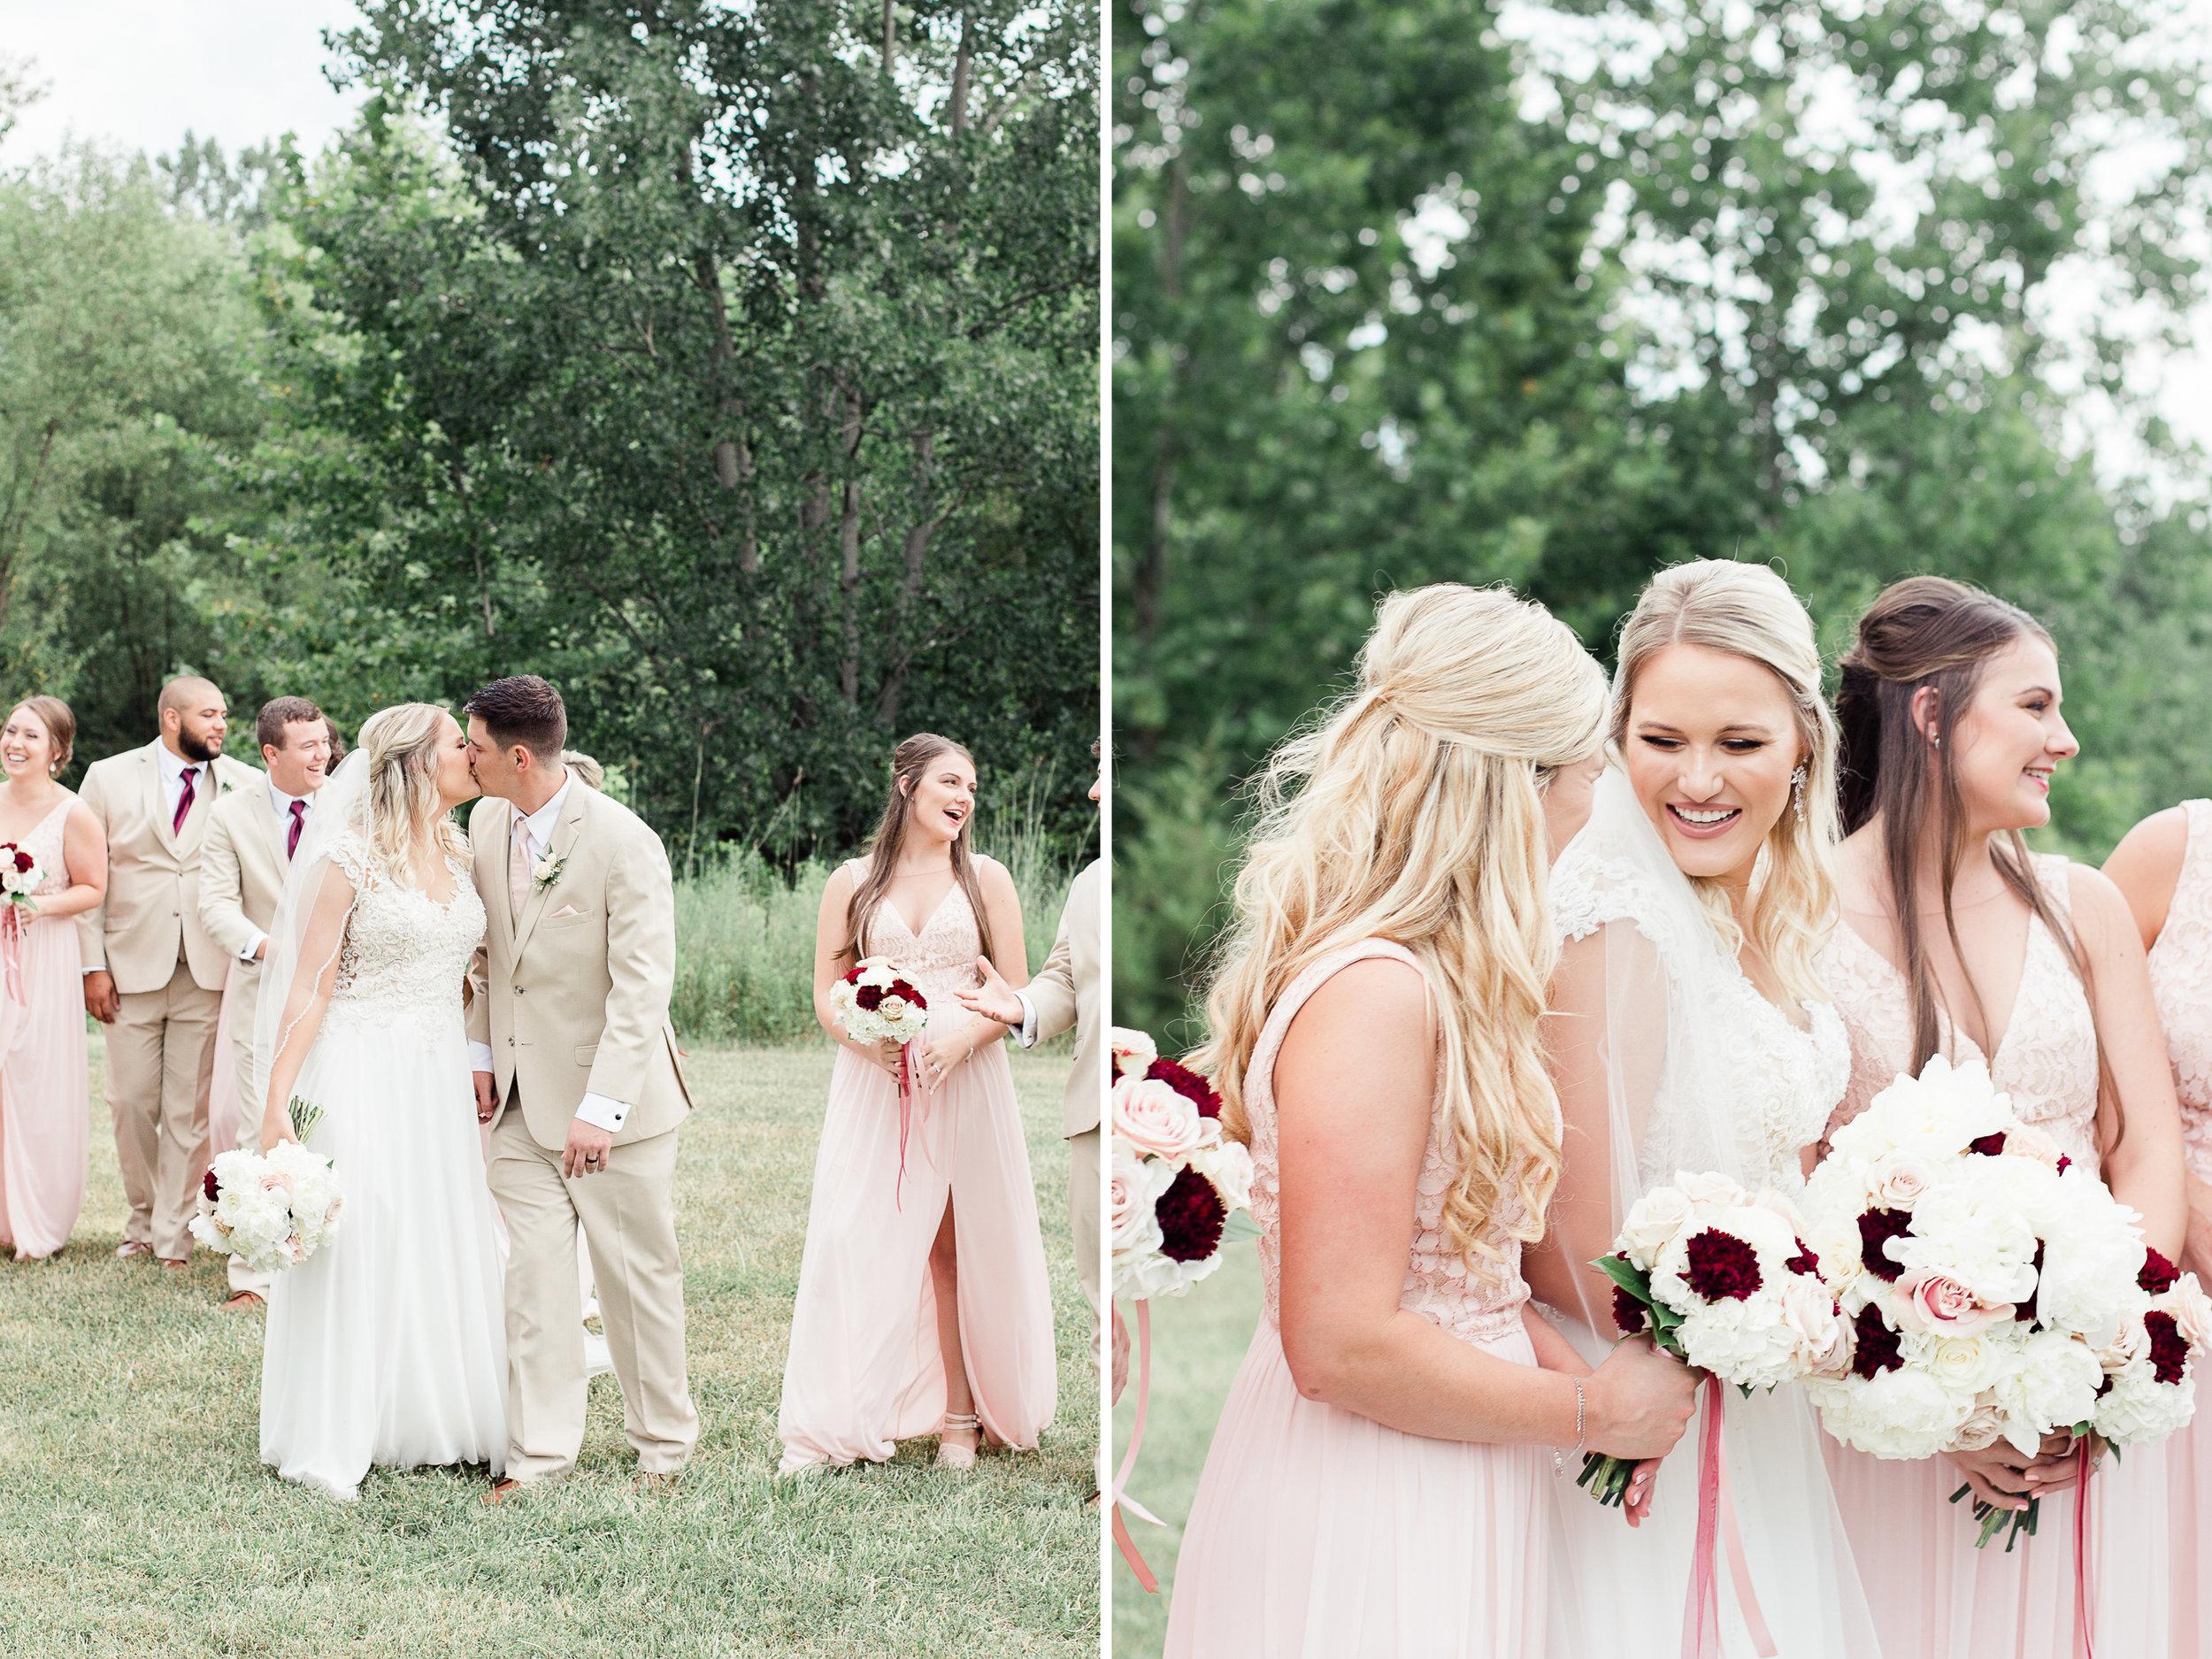 Dorothy_Louise_Photography_Marissa_Jake_Wentzville_MO_Wedding5.jpg